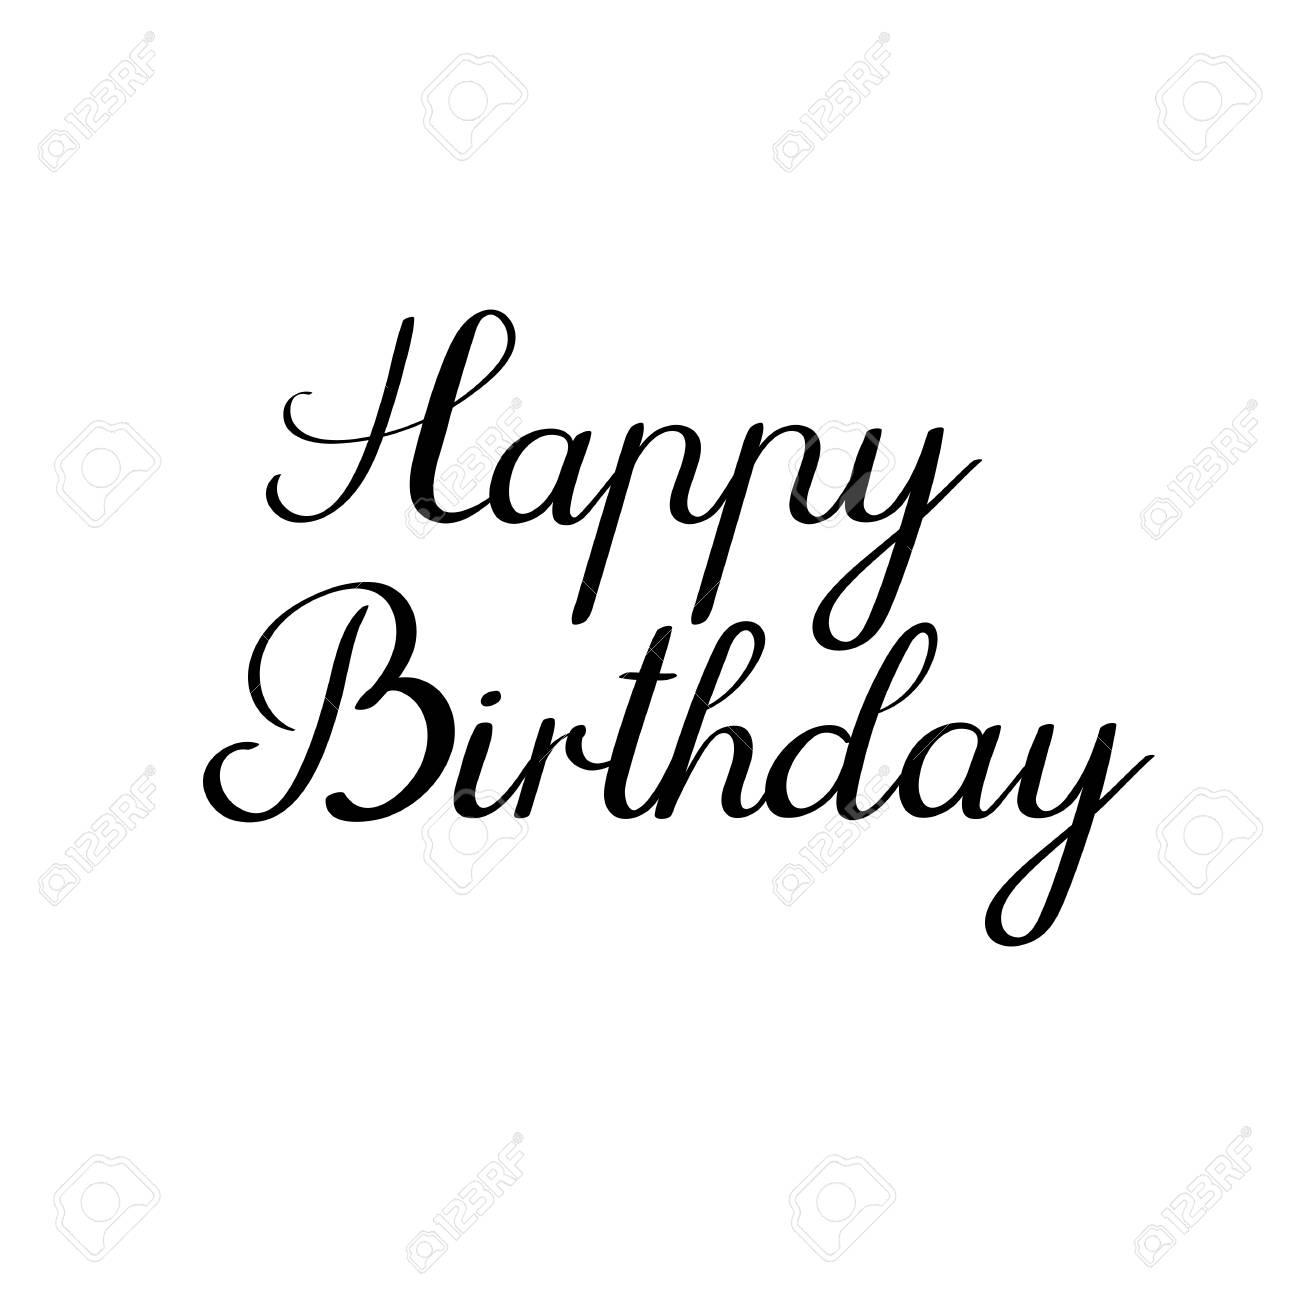 Happy birthday calligraphy inscription handwritten greeting happy birthday calligraphy inscription handwritten greeting card ink calligraphy stock vector 75943763 bookmarktalkfo Choice Image